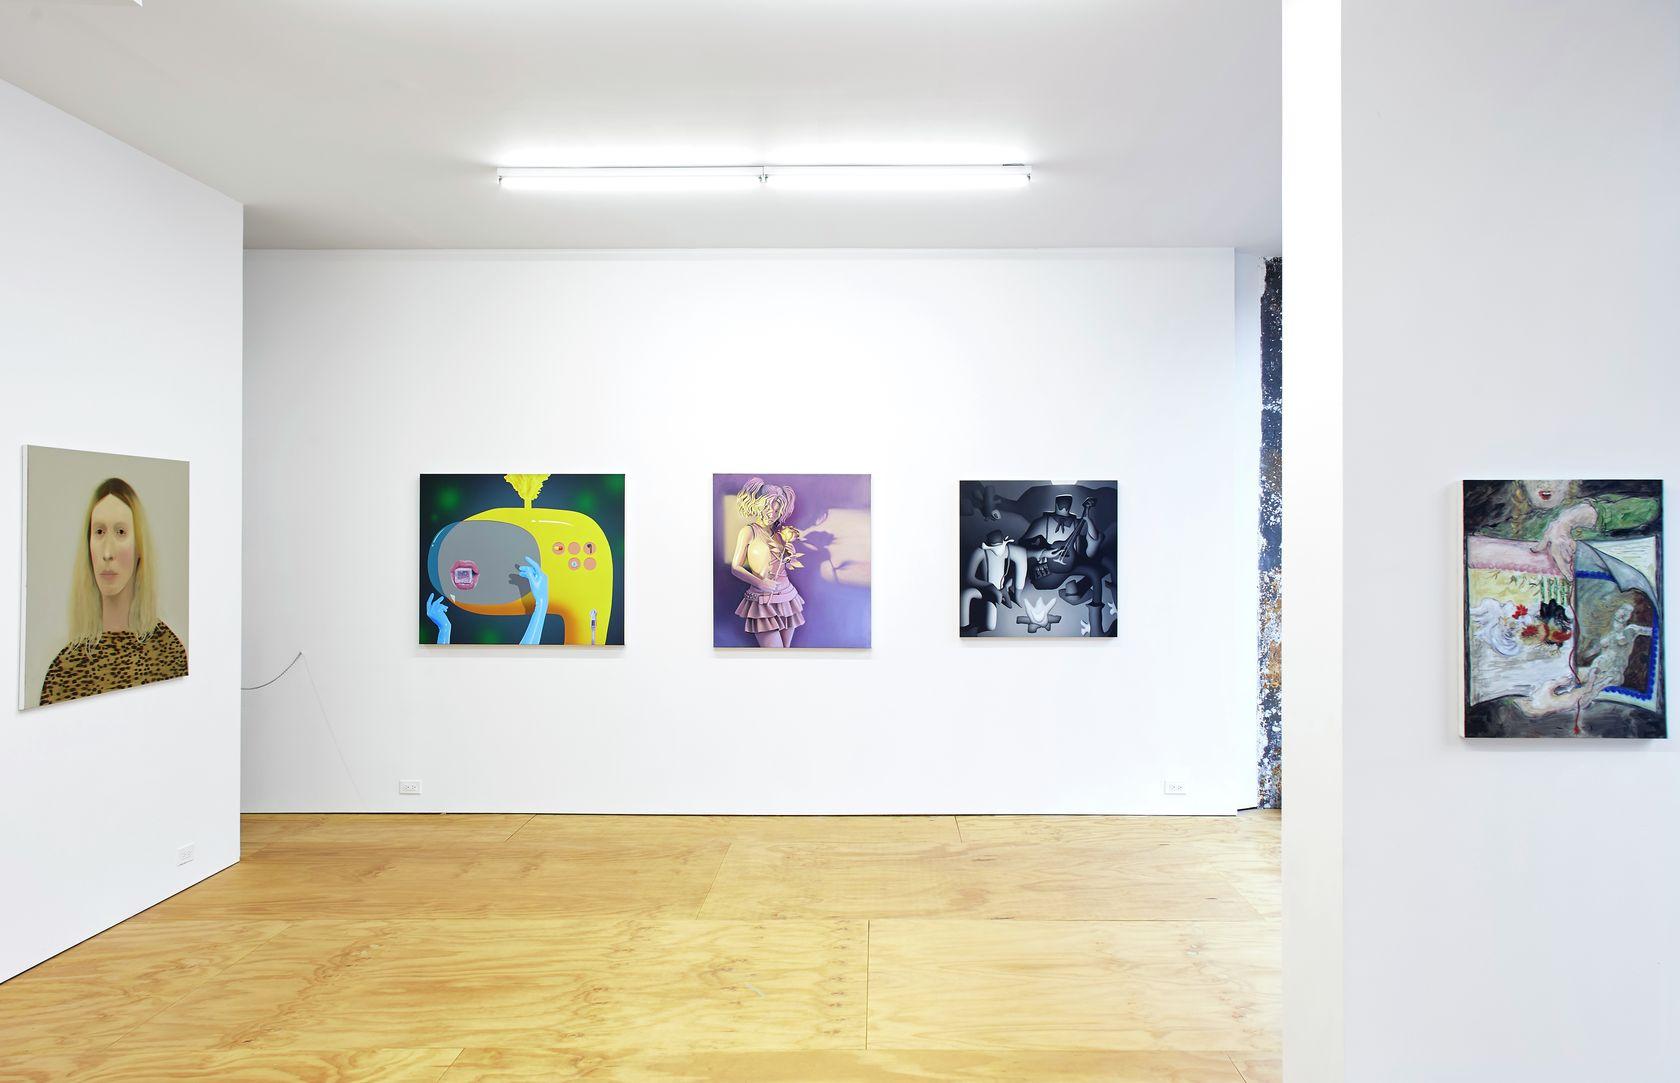 Anthony Cudahy & Oli Epp, Friend Zone (group)  - Half Gallery - New York 28 janvier  — 24 février 2021